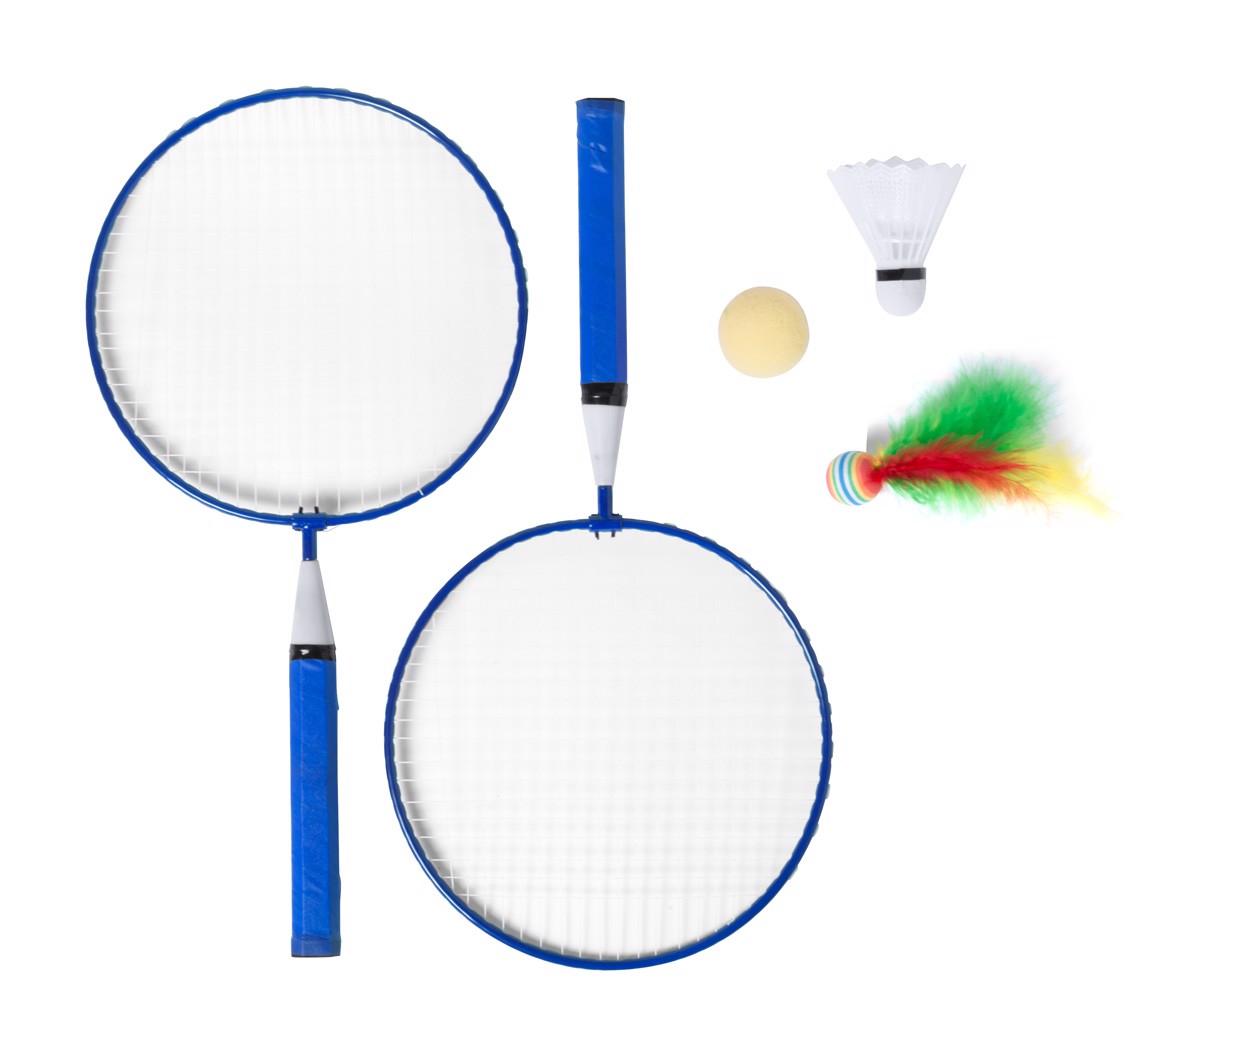 Sada Na Badminton Dylam - Modrá